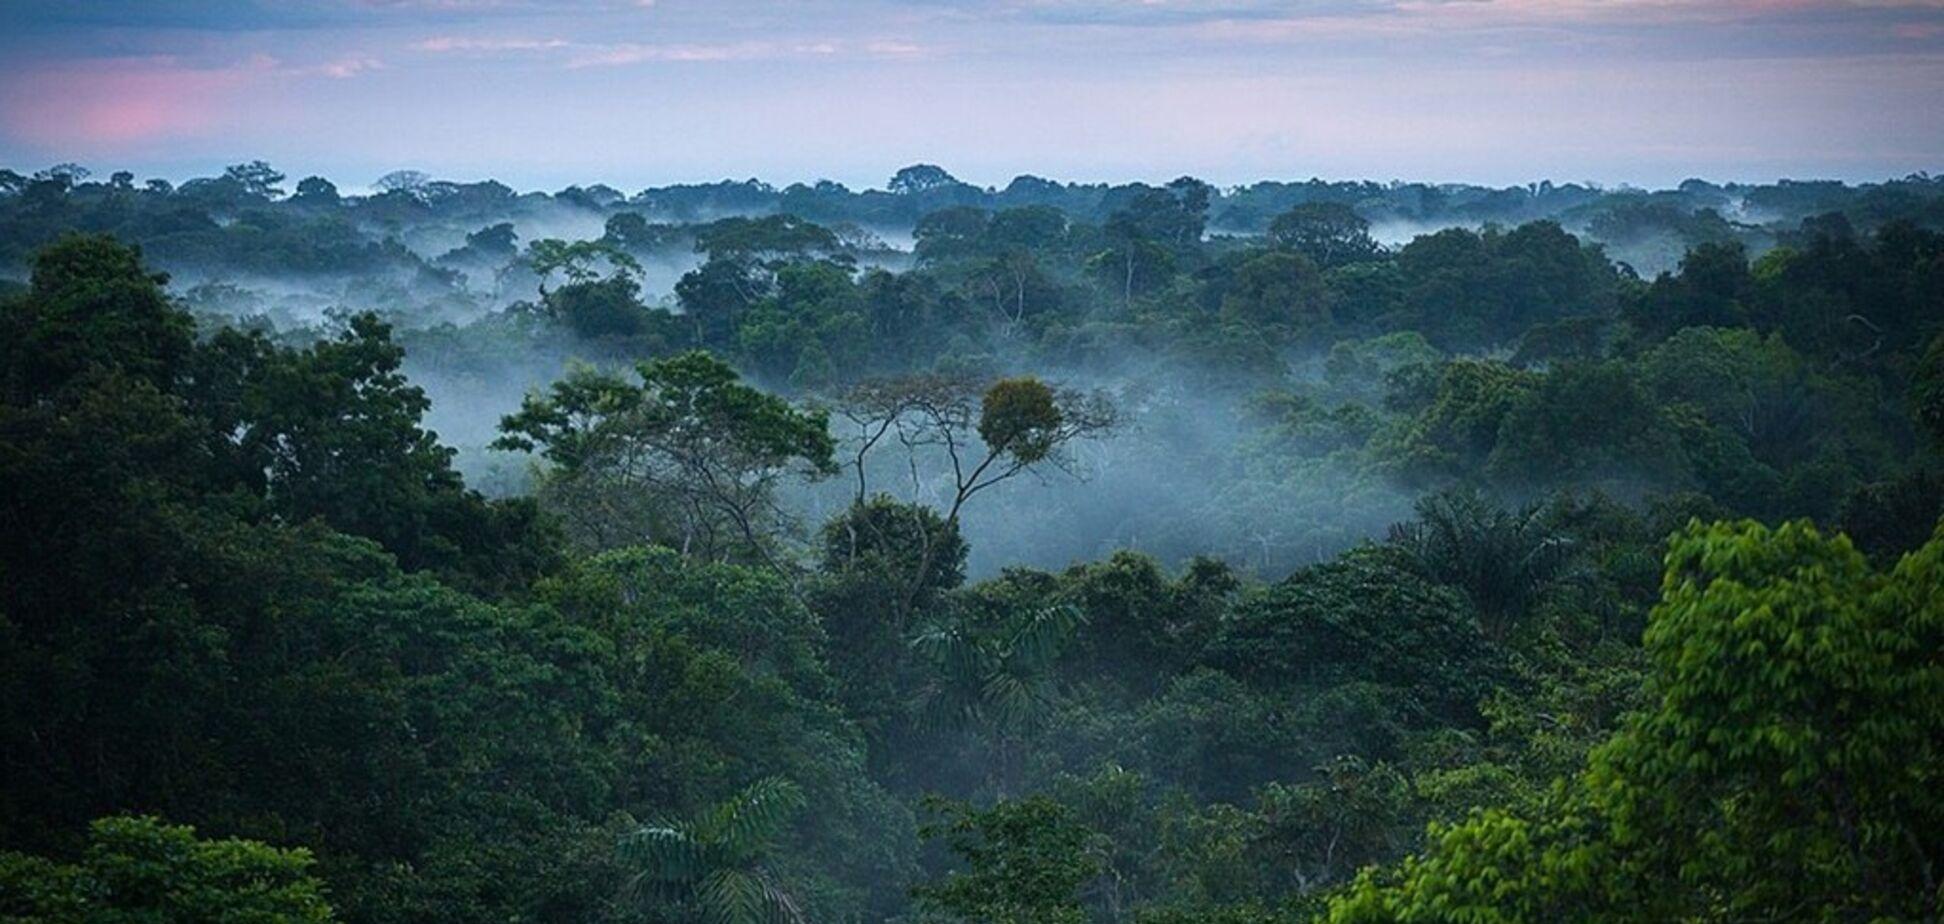 Точка невозврата: тропические леса начали отравлять атмосферу